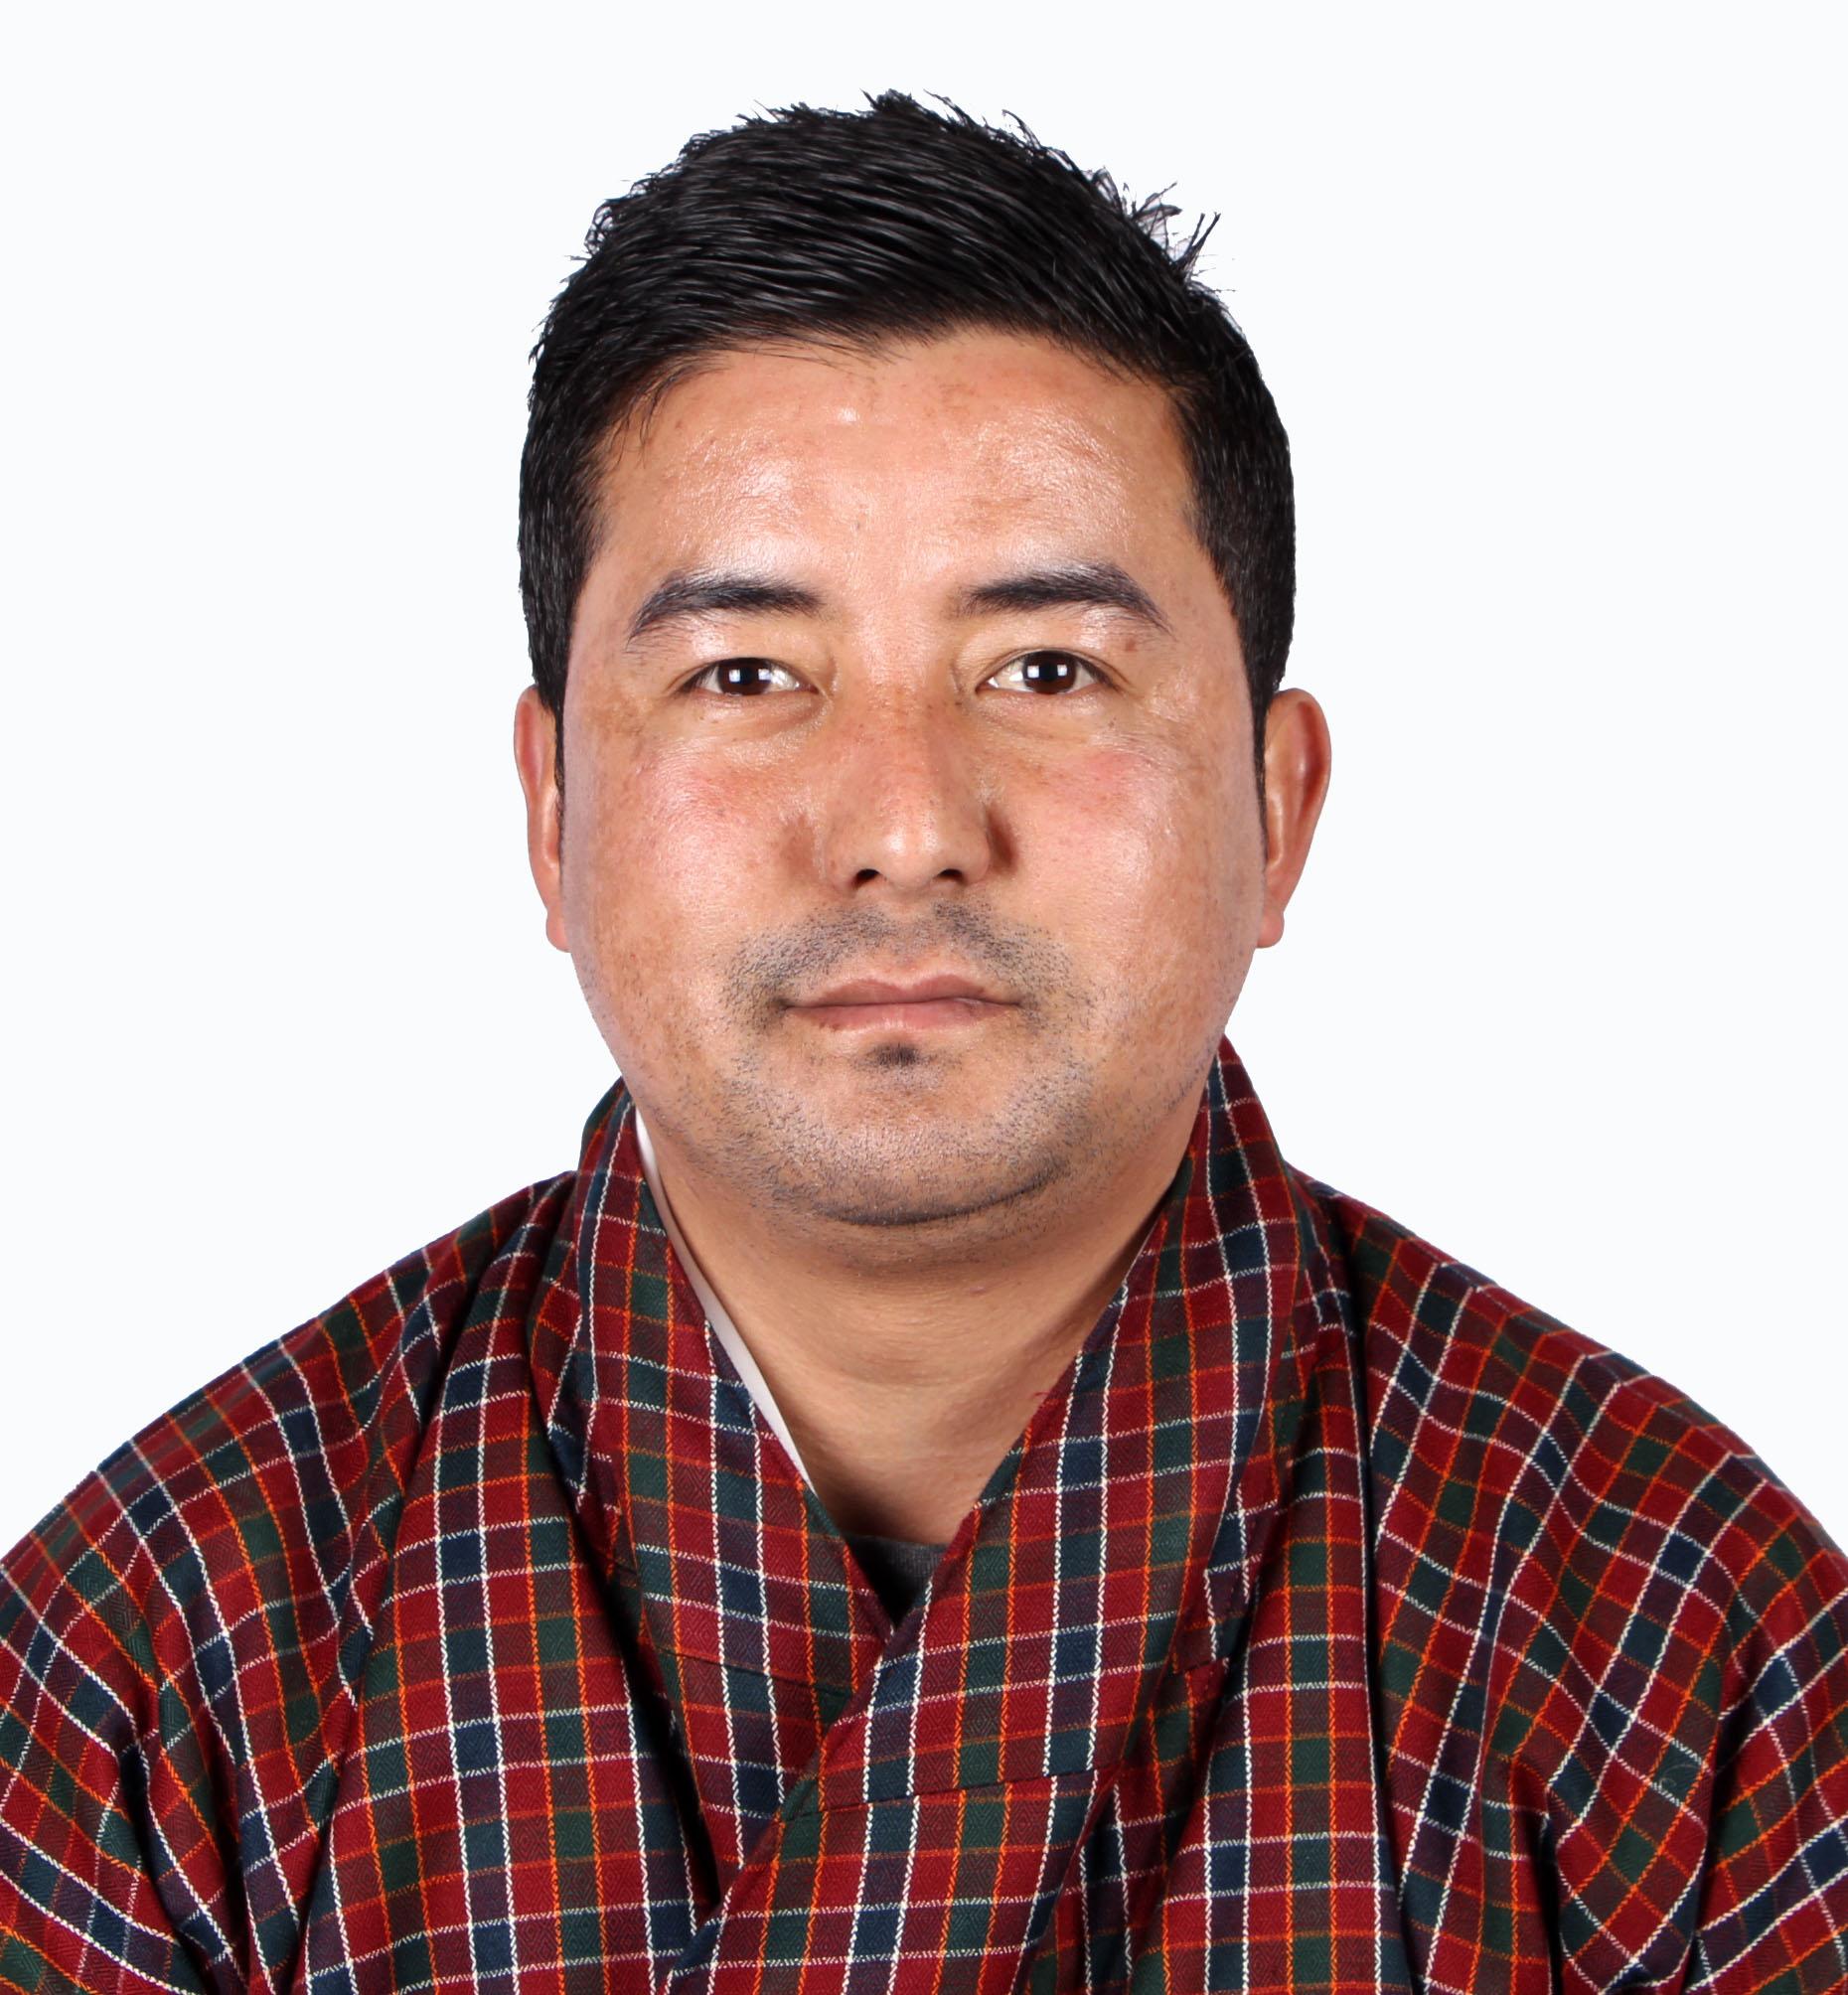 Mr. Bejulay Gurung